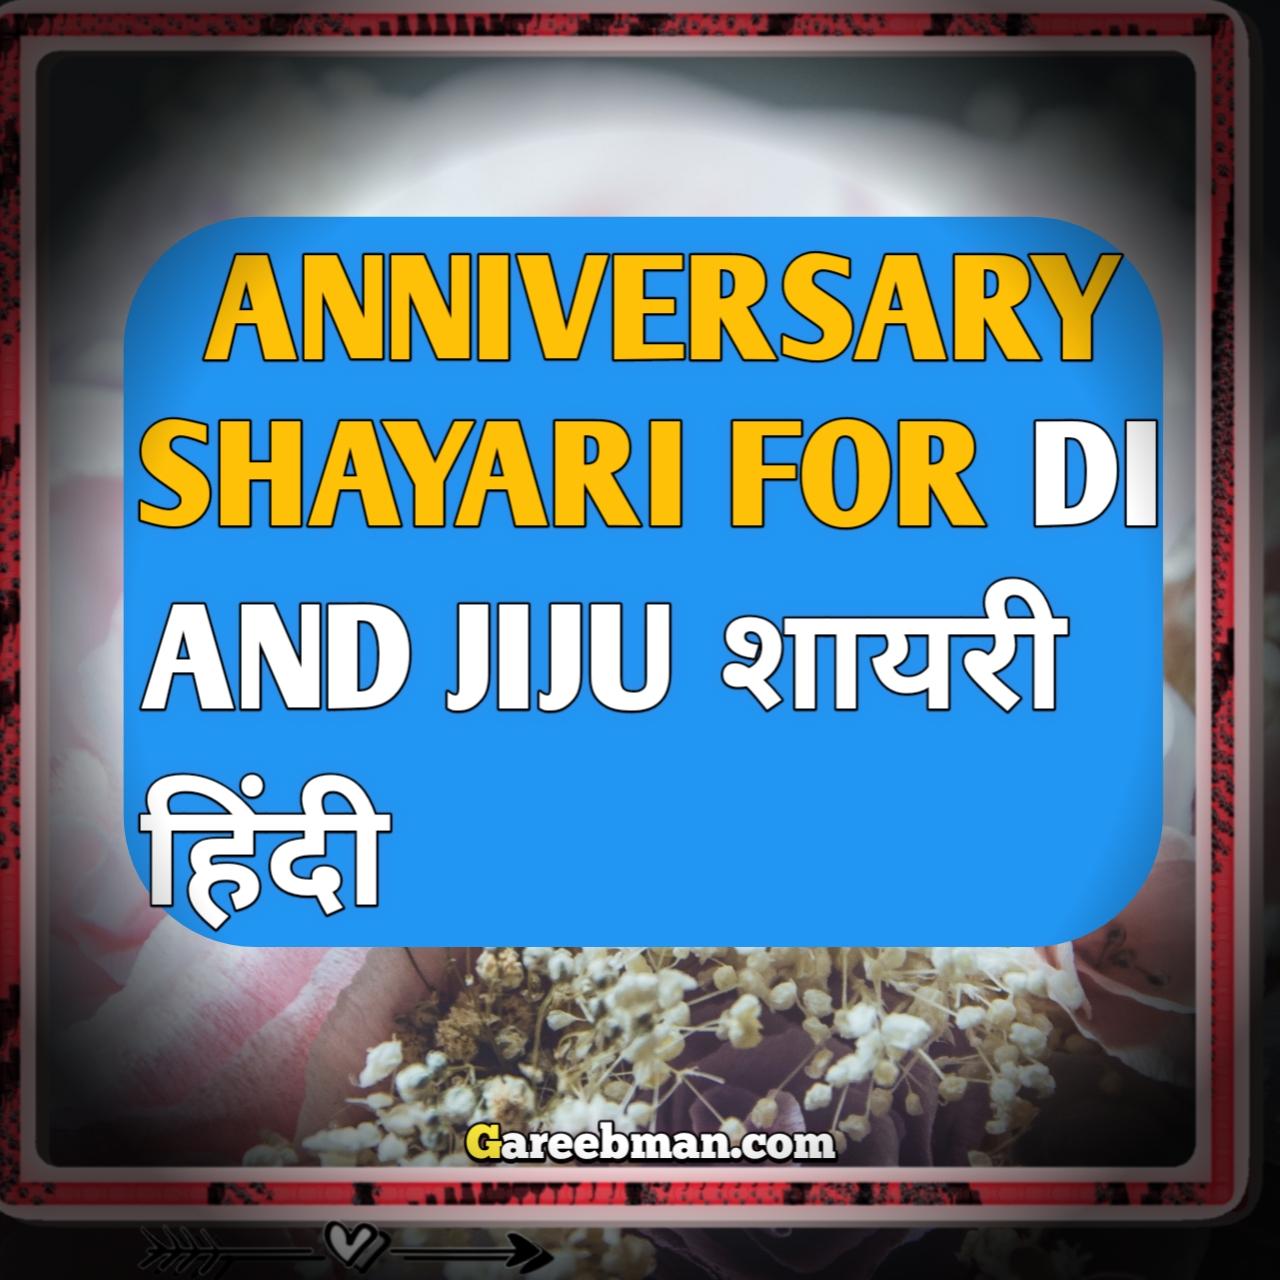 Anniversary Shayari and Status for didi aur jija